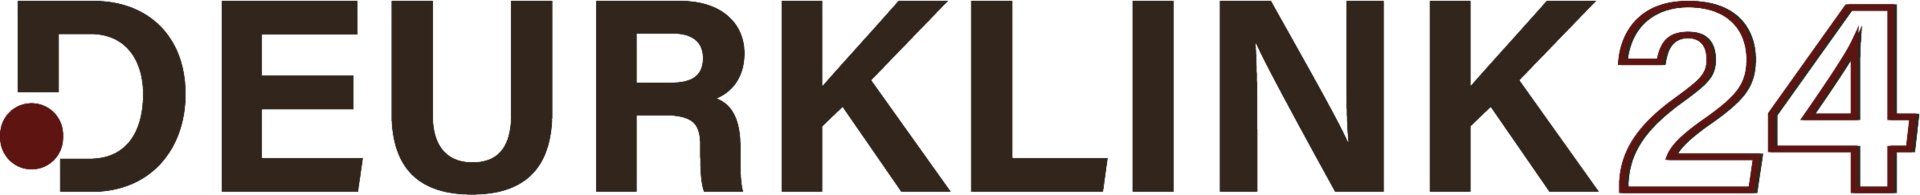 Deurklink24 logo